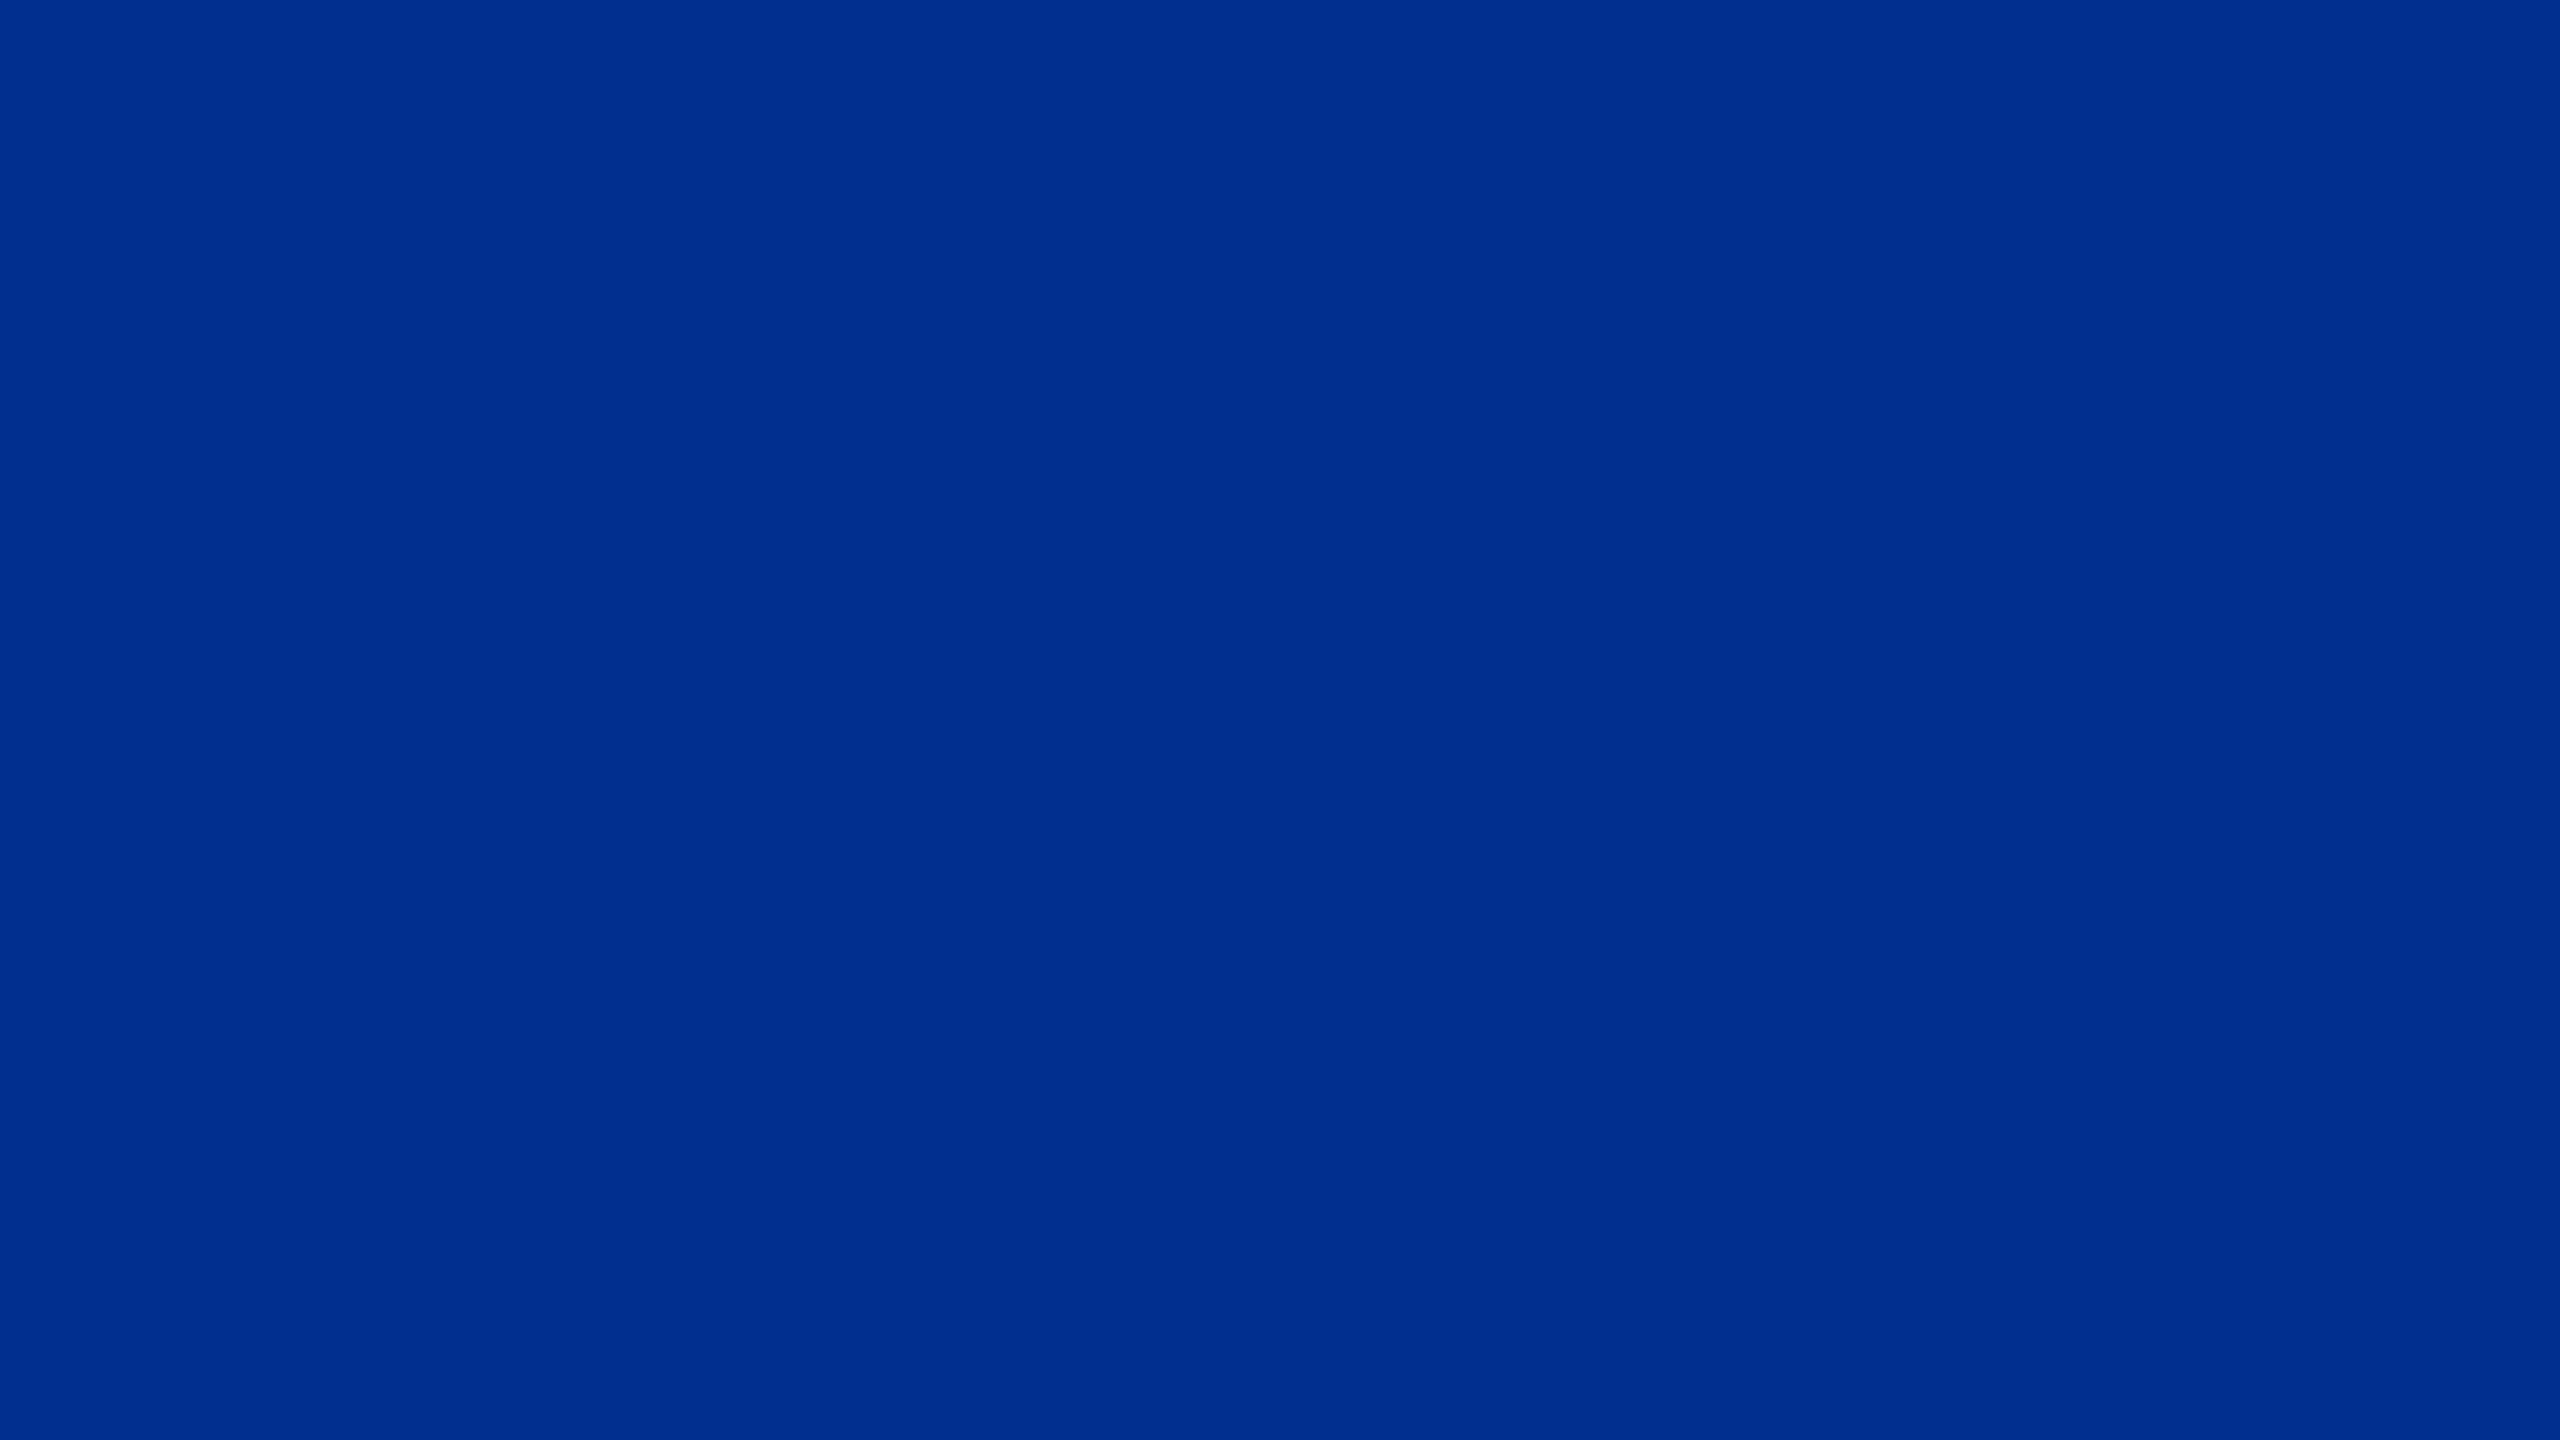 download 2560x1440 blue white - photo #15